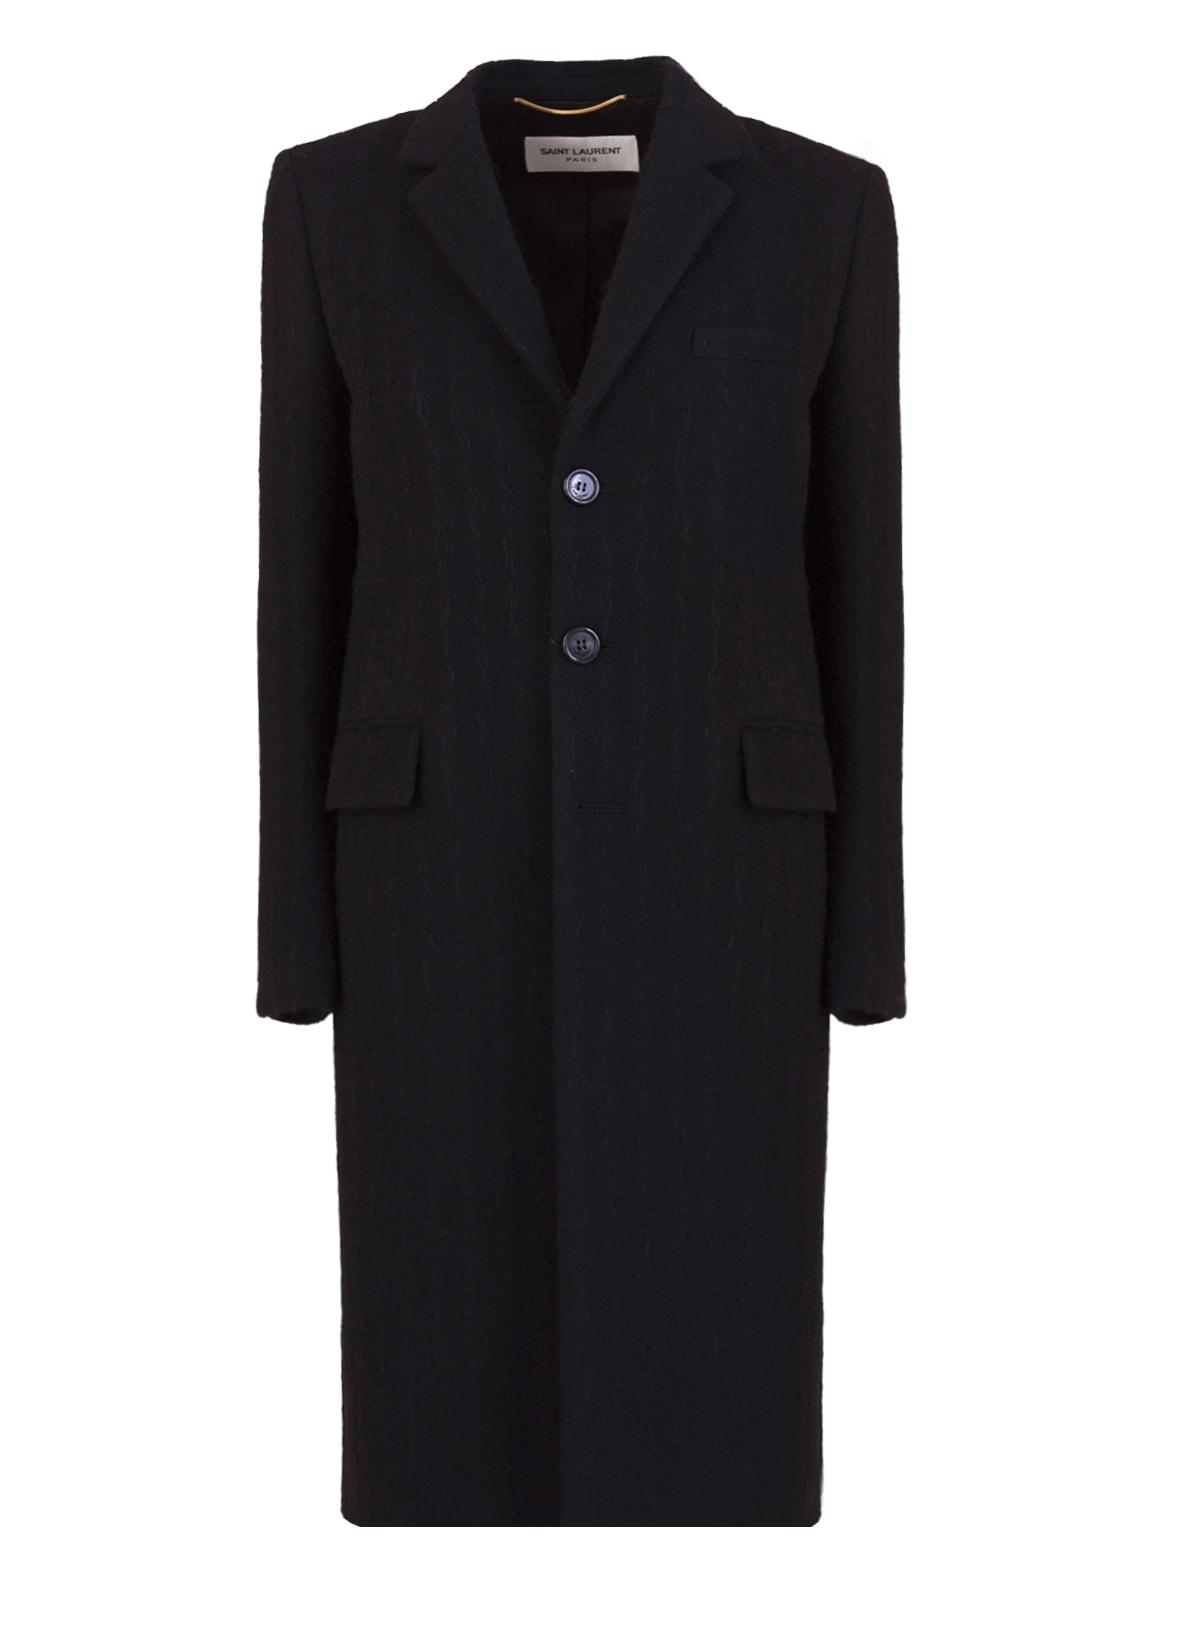 Saint Laurent Chesterfeild Coat